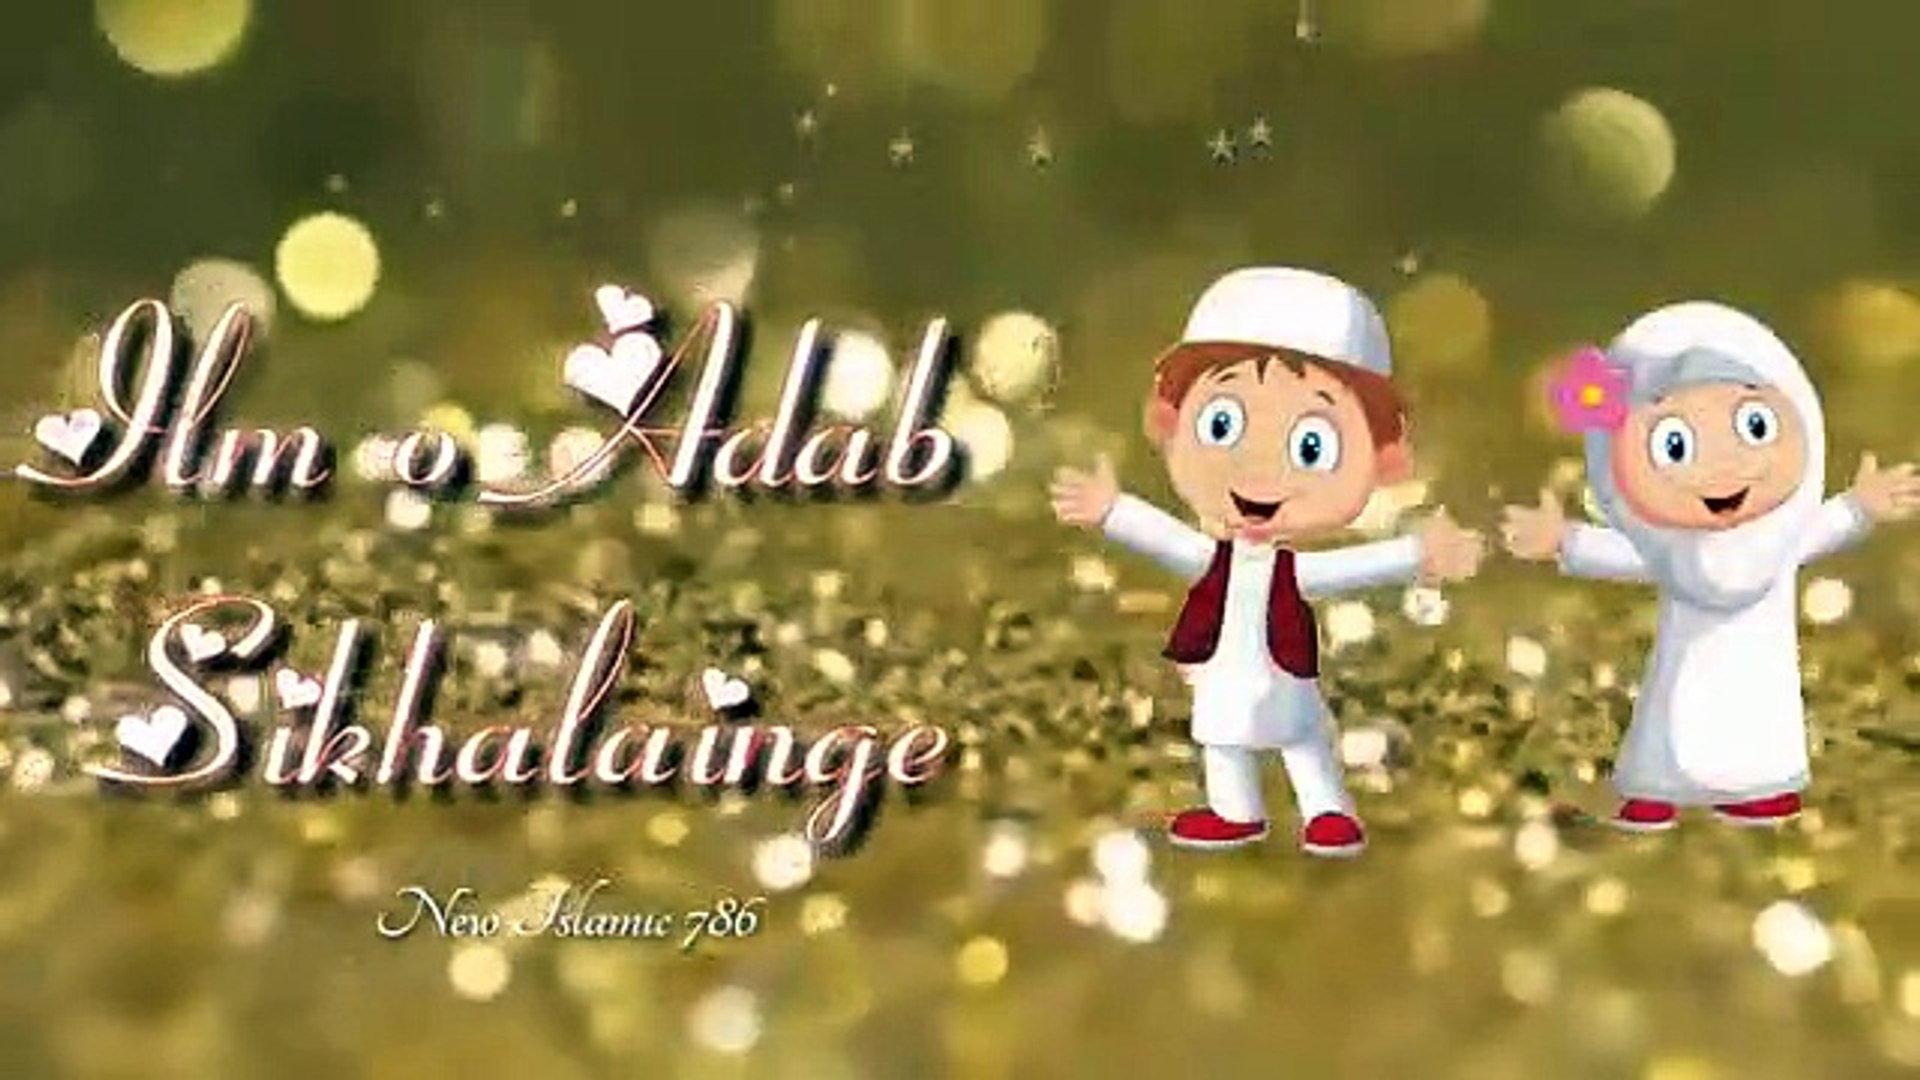 ❤New_Ramzan_status_2019❤❤_Ramzan_coming_soon_WhatsApp_Status_⭐⭐⭐_New_Islamic_W,  Tu Kuja man Kuja -